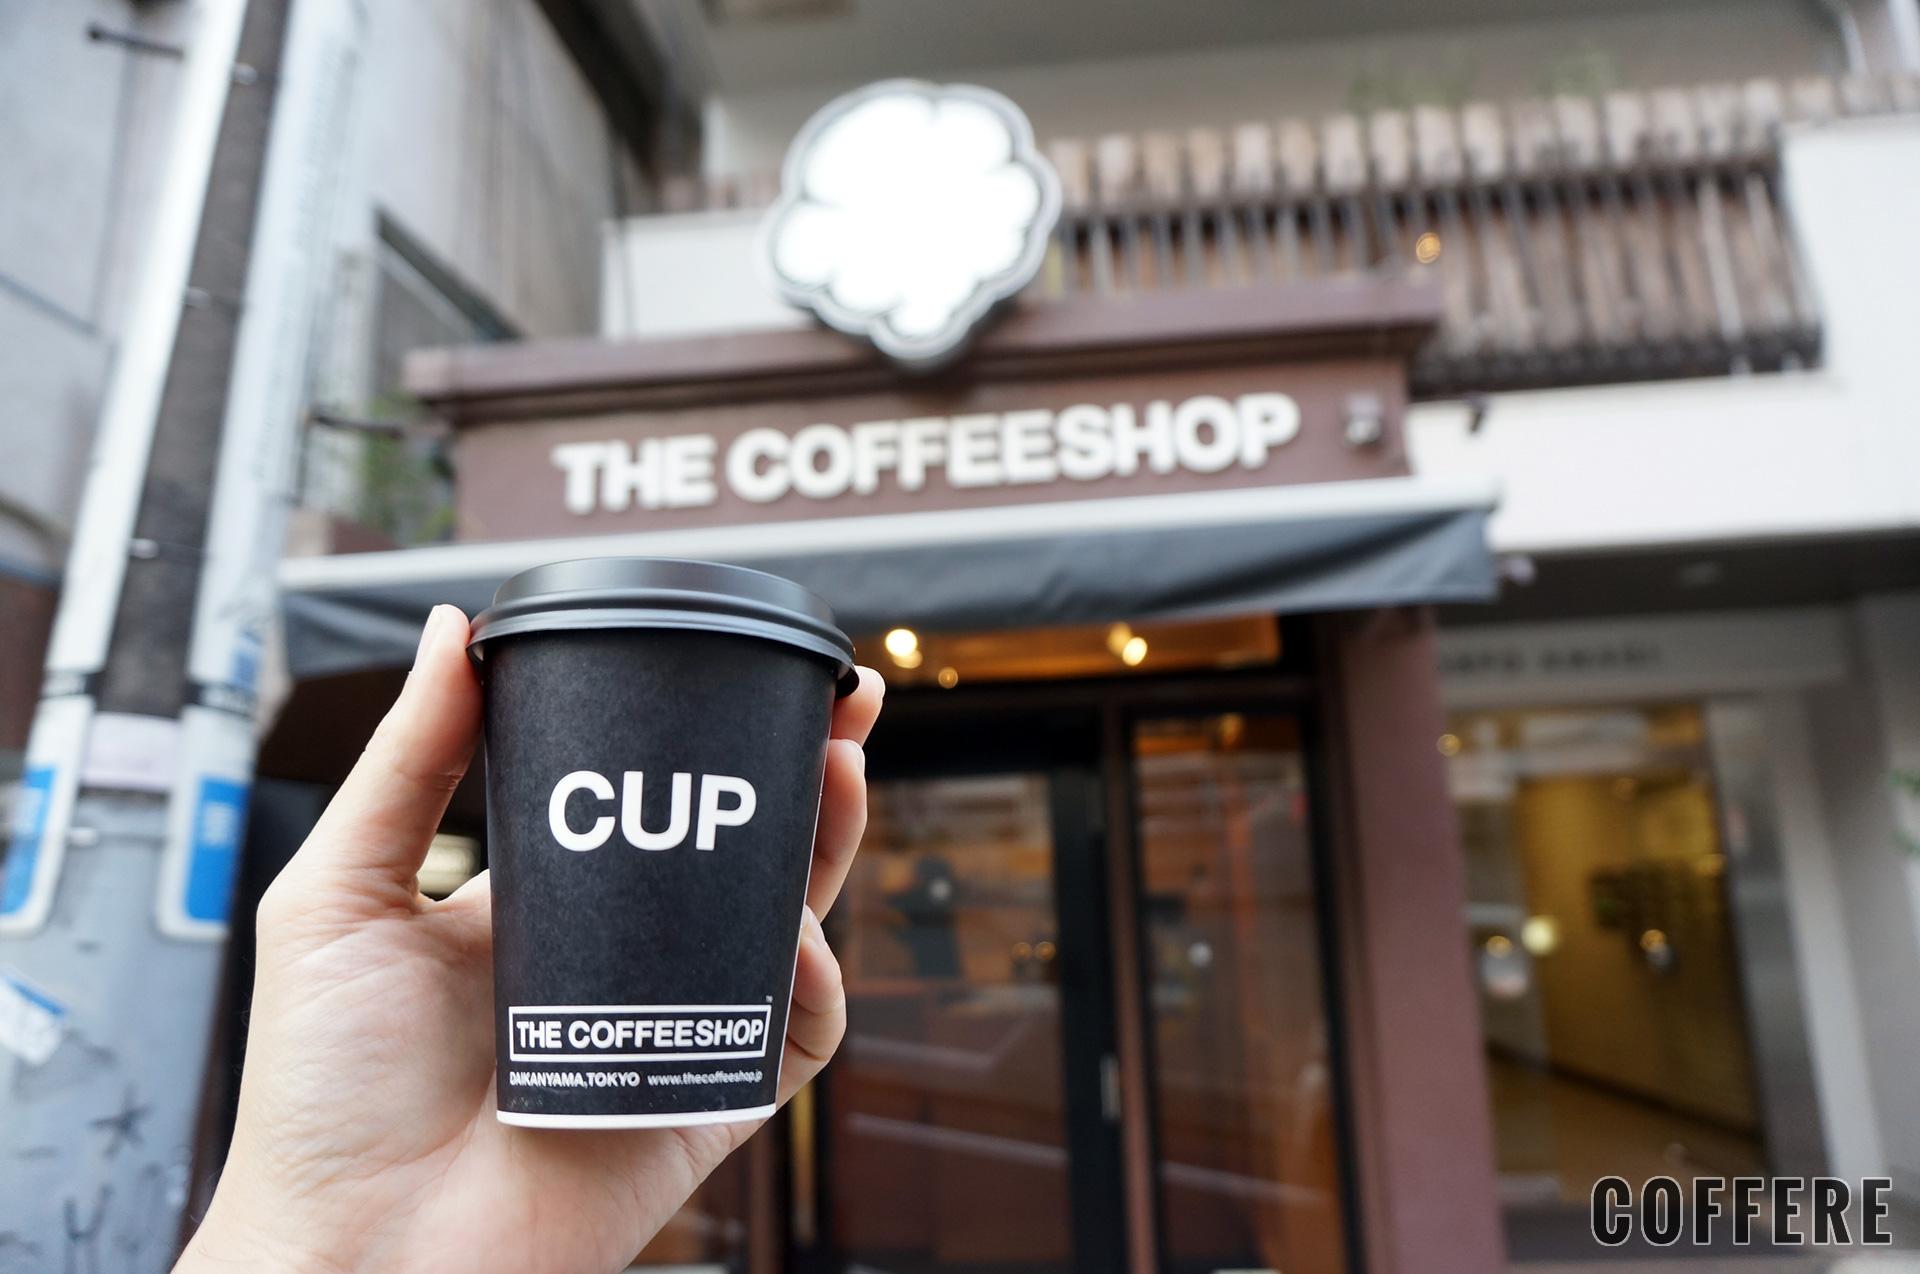 THE COFFEESHOPのコーヒーカップ。店舗前で。